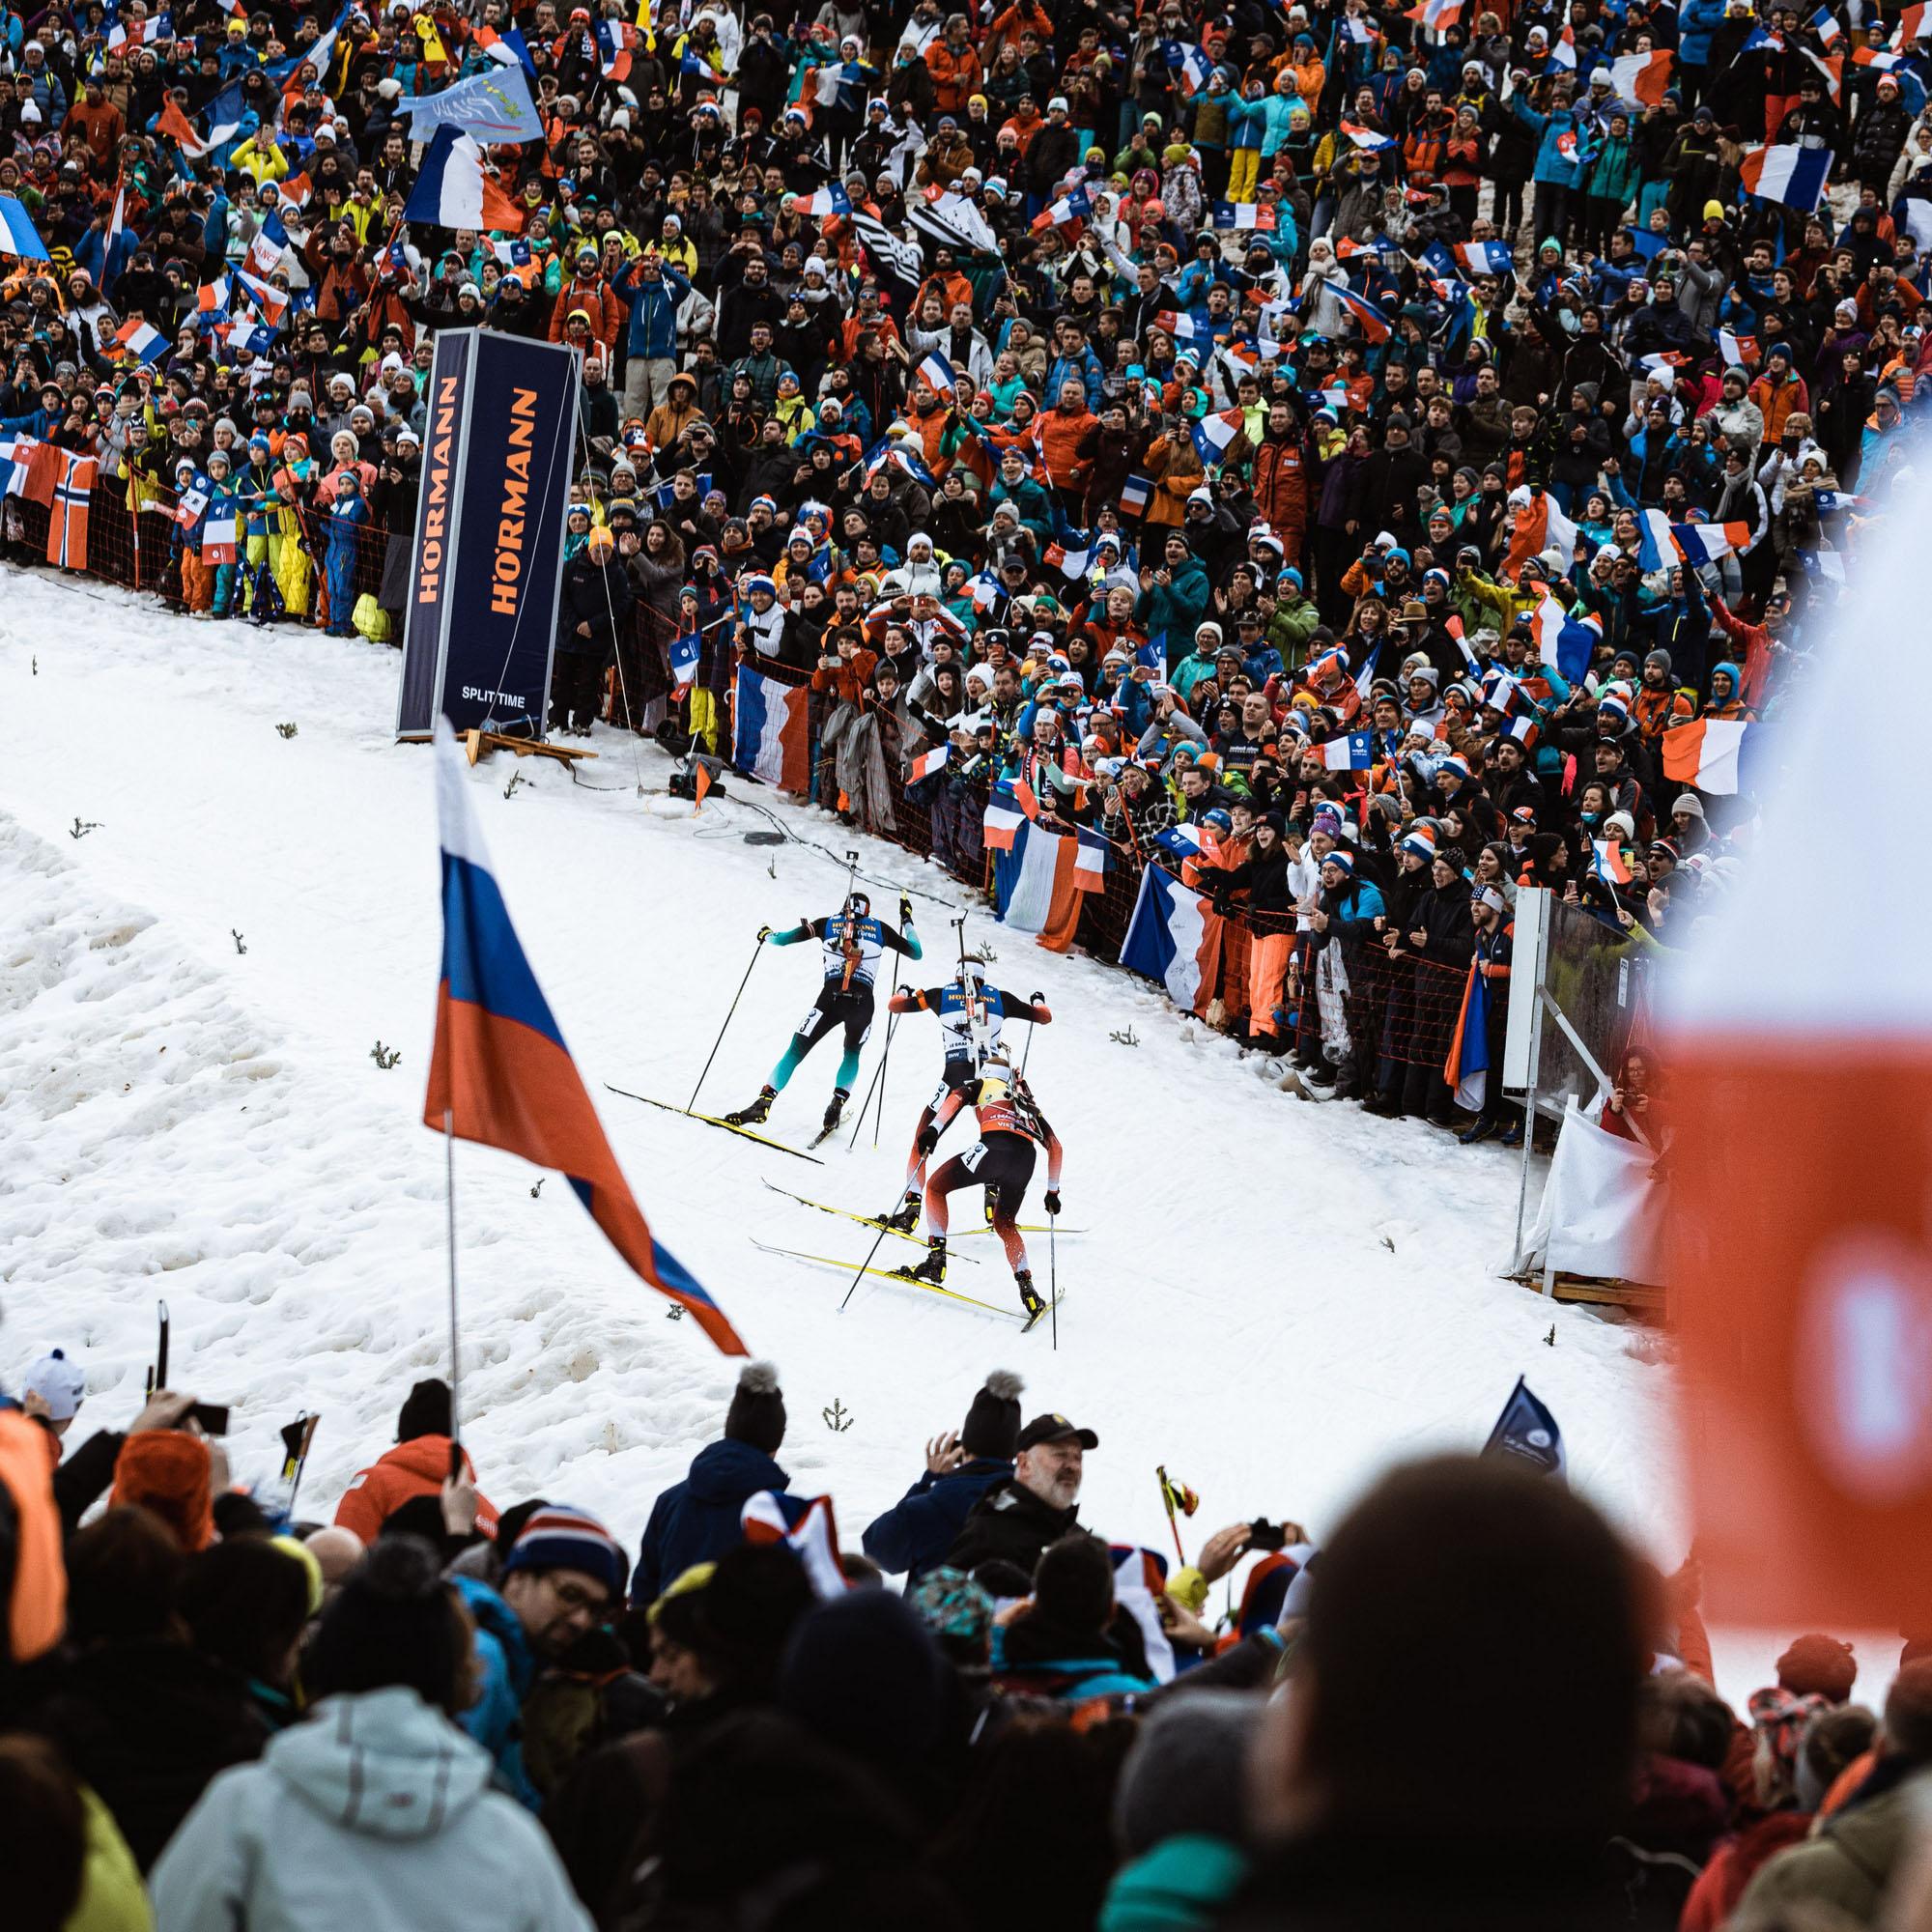 biathlon-grand-bornand-annecy-competitions-c-hudry-aravis-coupedumonde-ibu - © C. Hudry